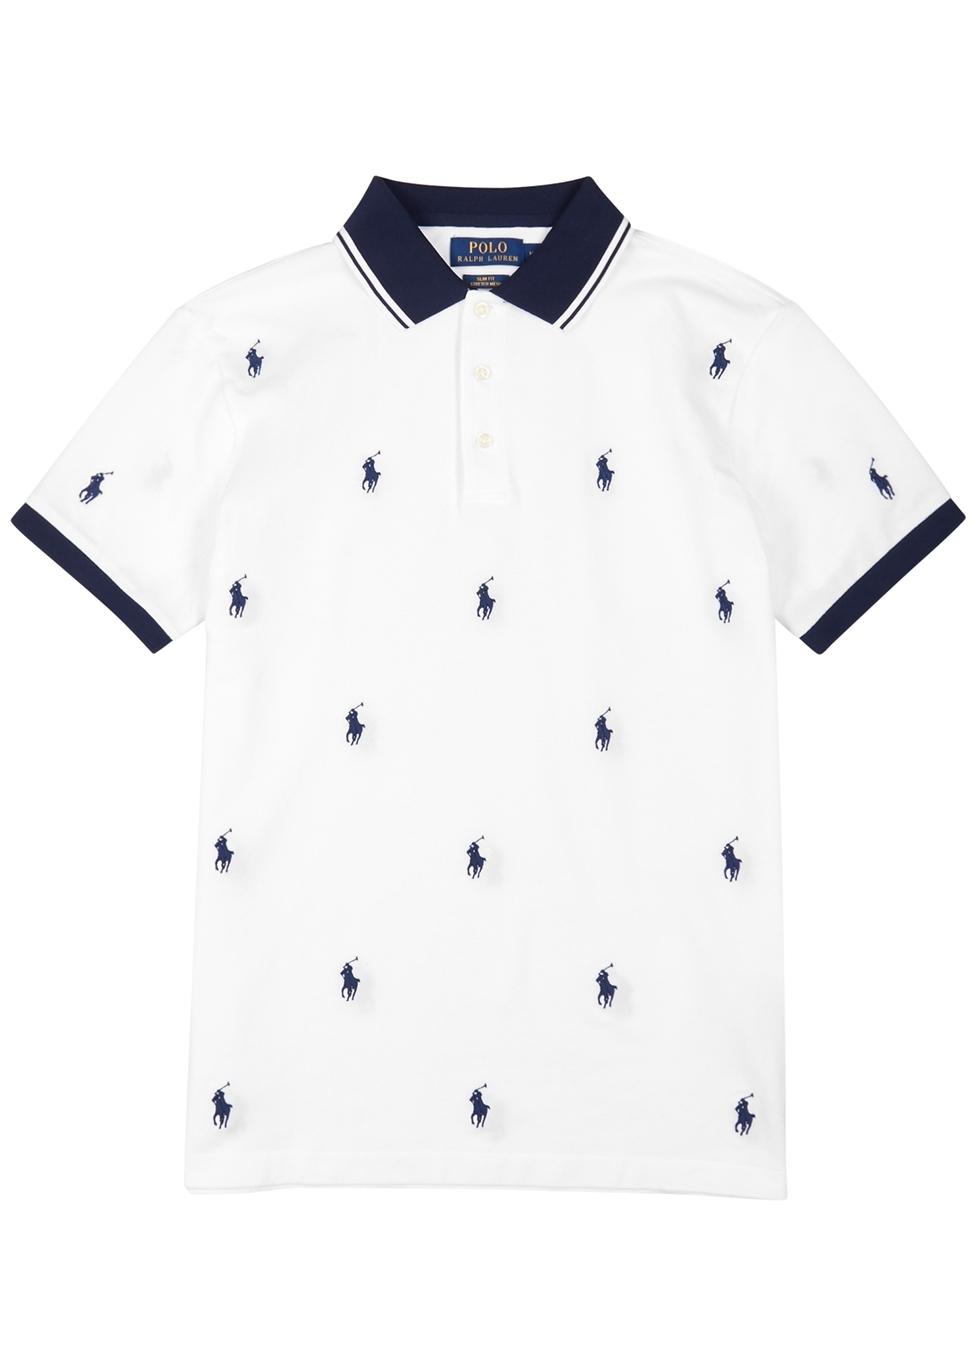 36c3aa341a41 Men s Designer Polo Shirts - Harvey Nichols